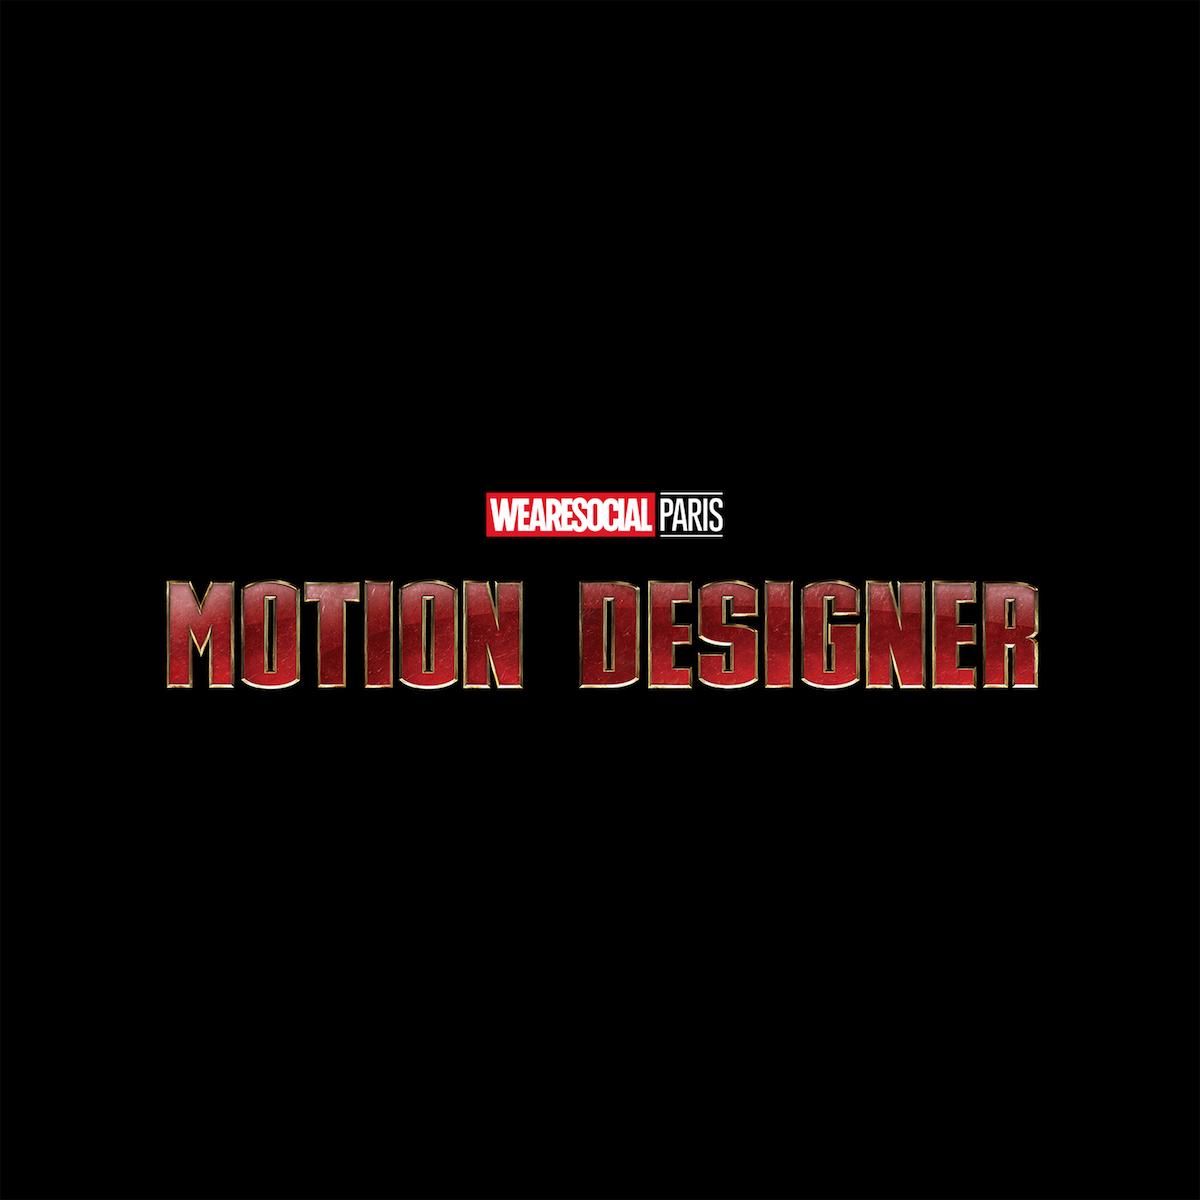 Superhero Logos for creative agency job titles - Motion Designer / Iron Man